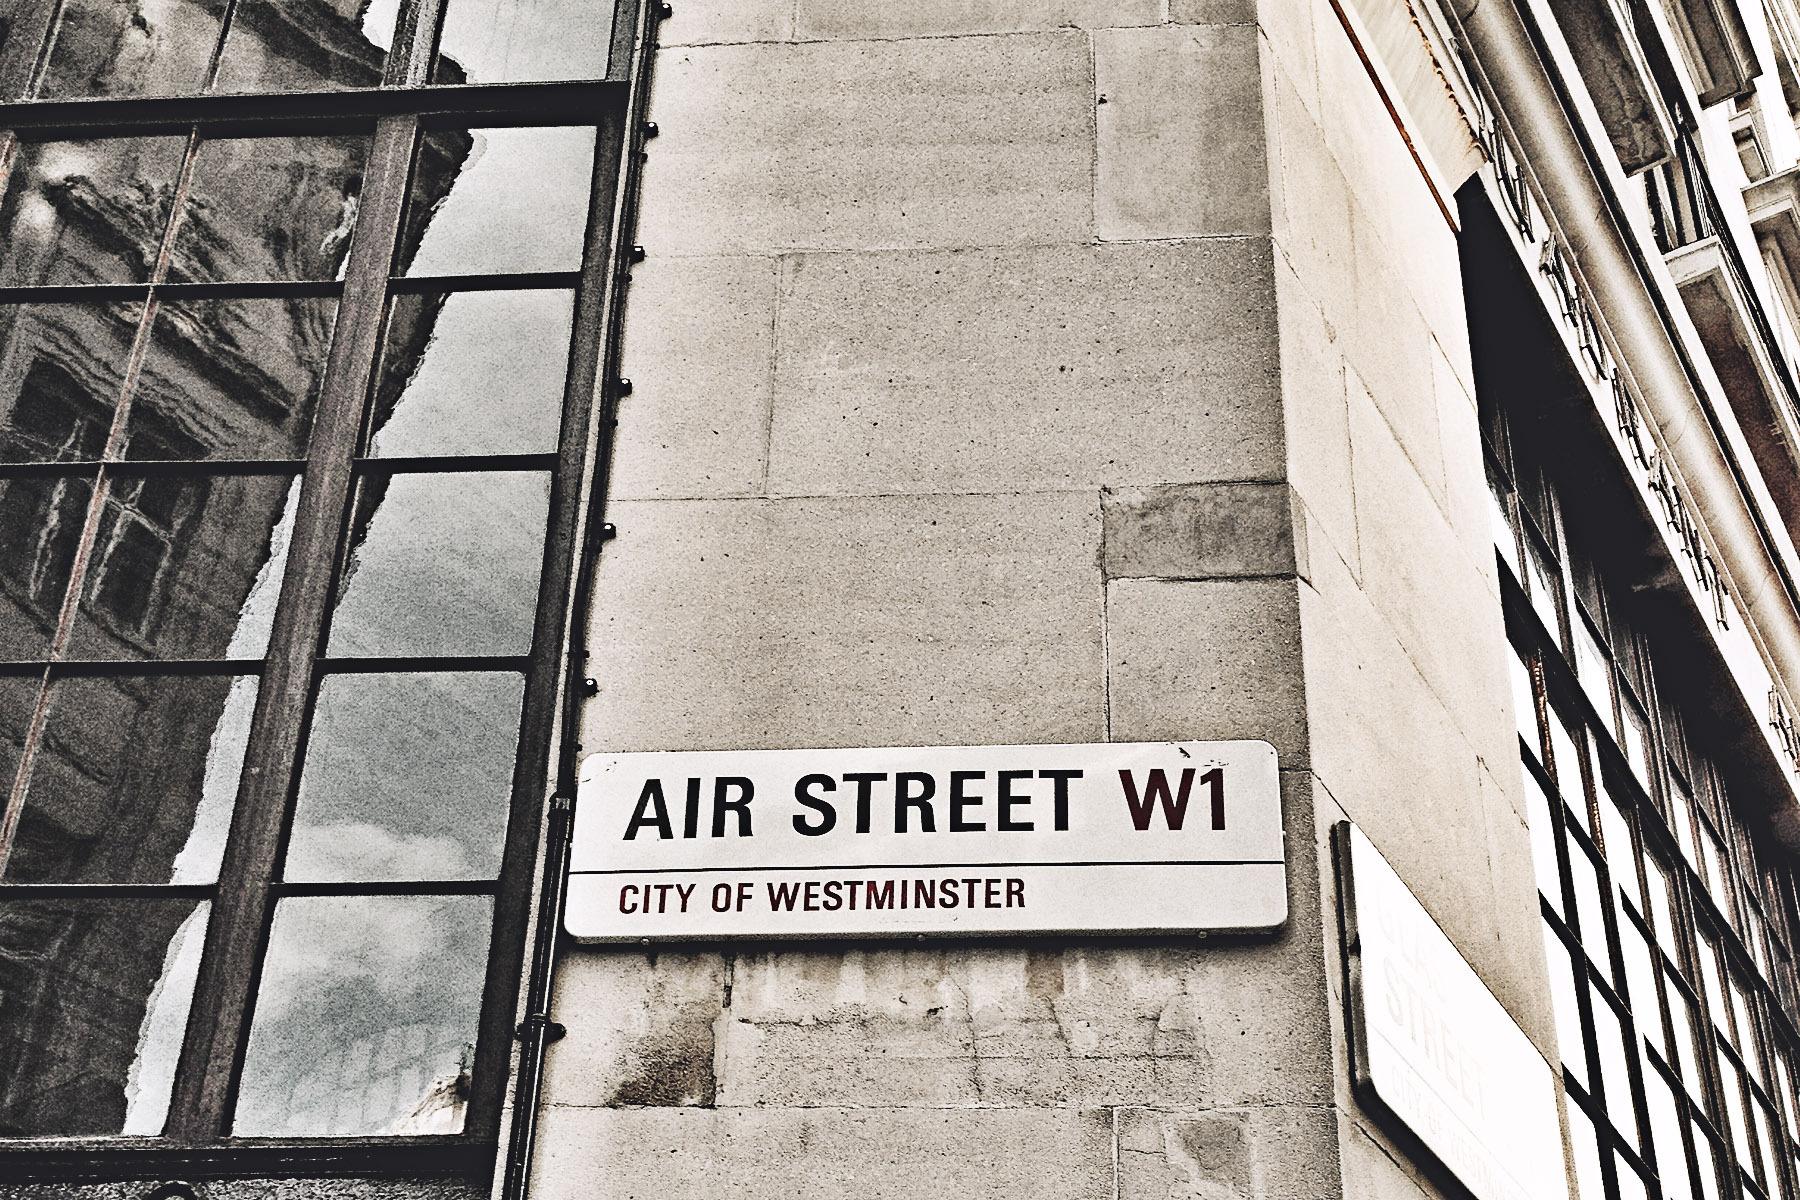 Air Street W1, London, UK